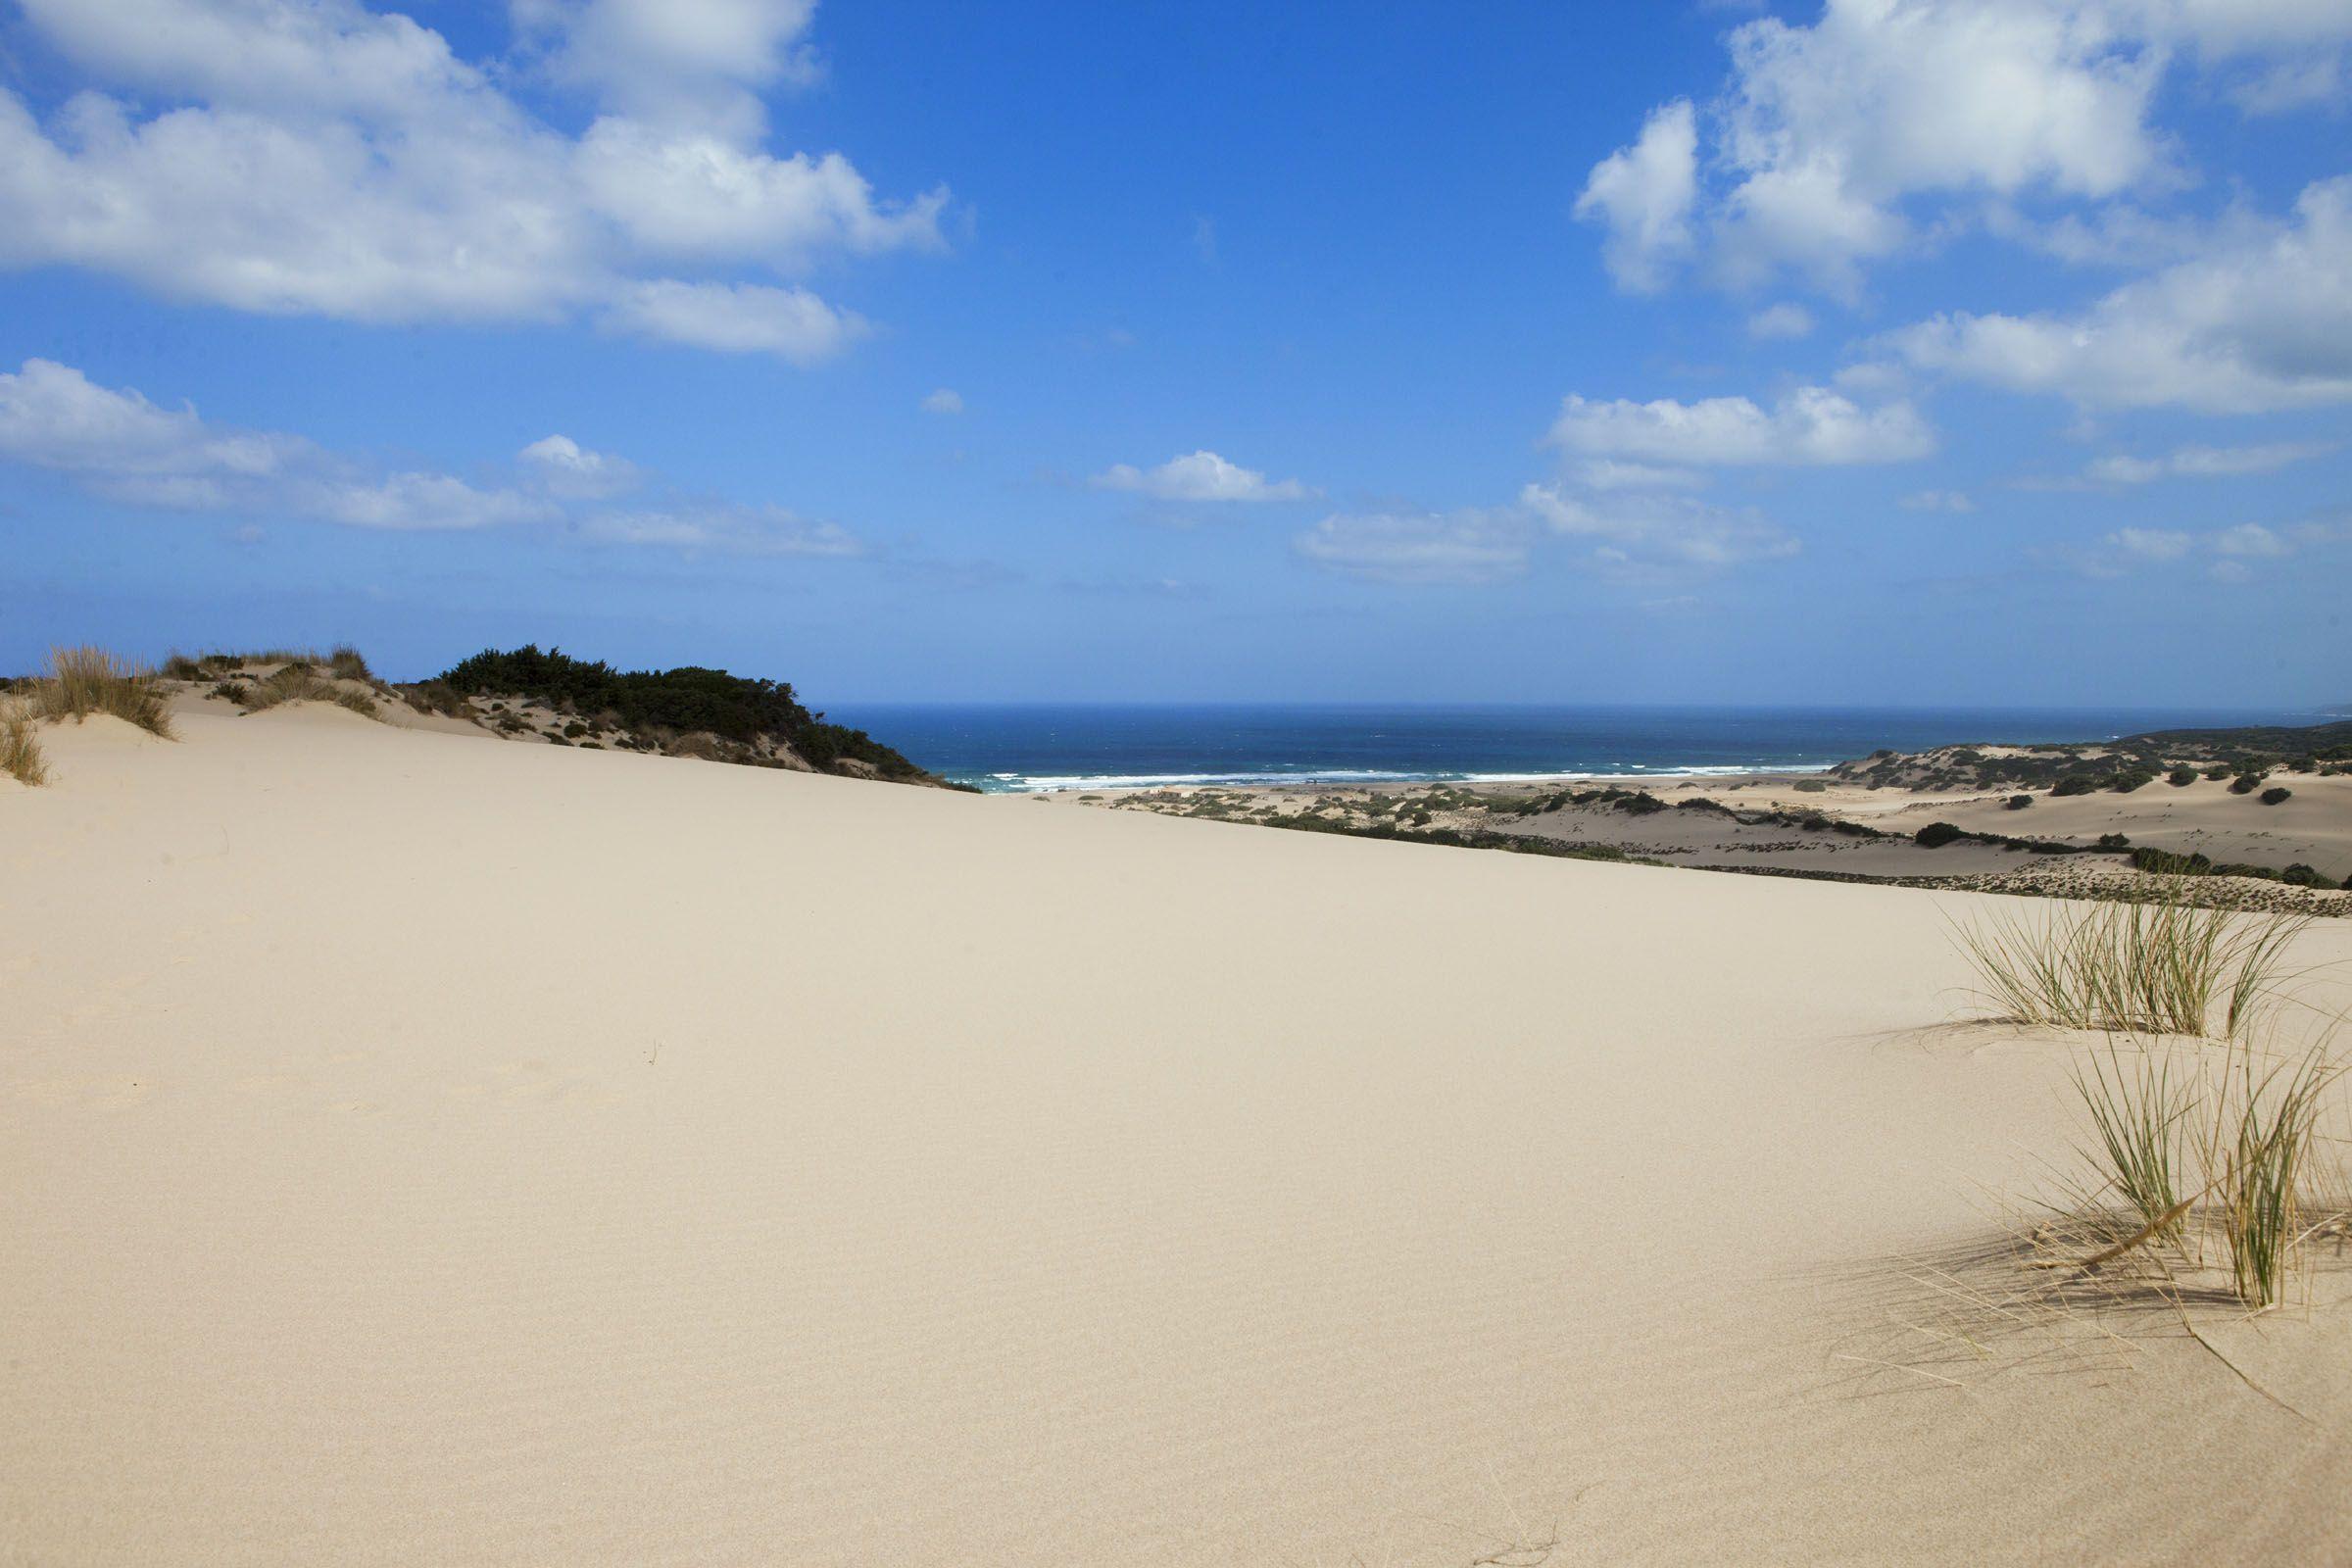 dune di piscinas piscinas dunes piscinas dune dunes